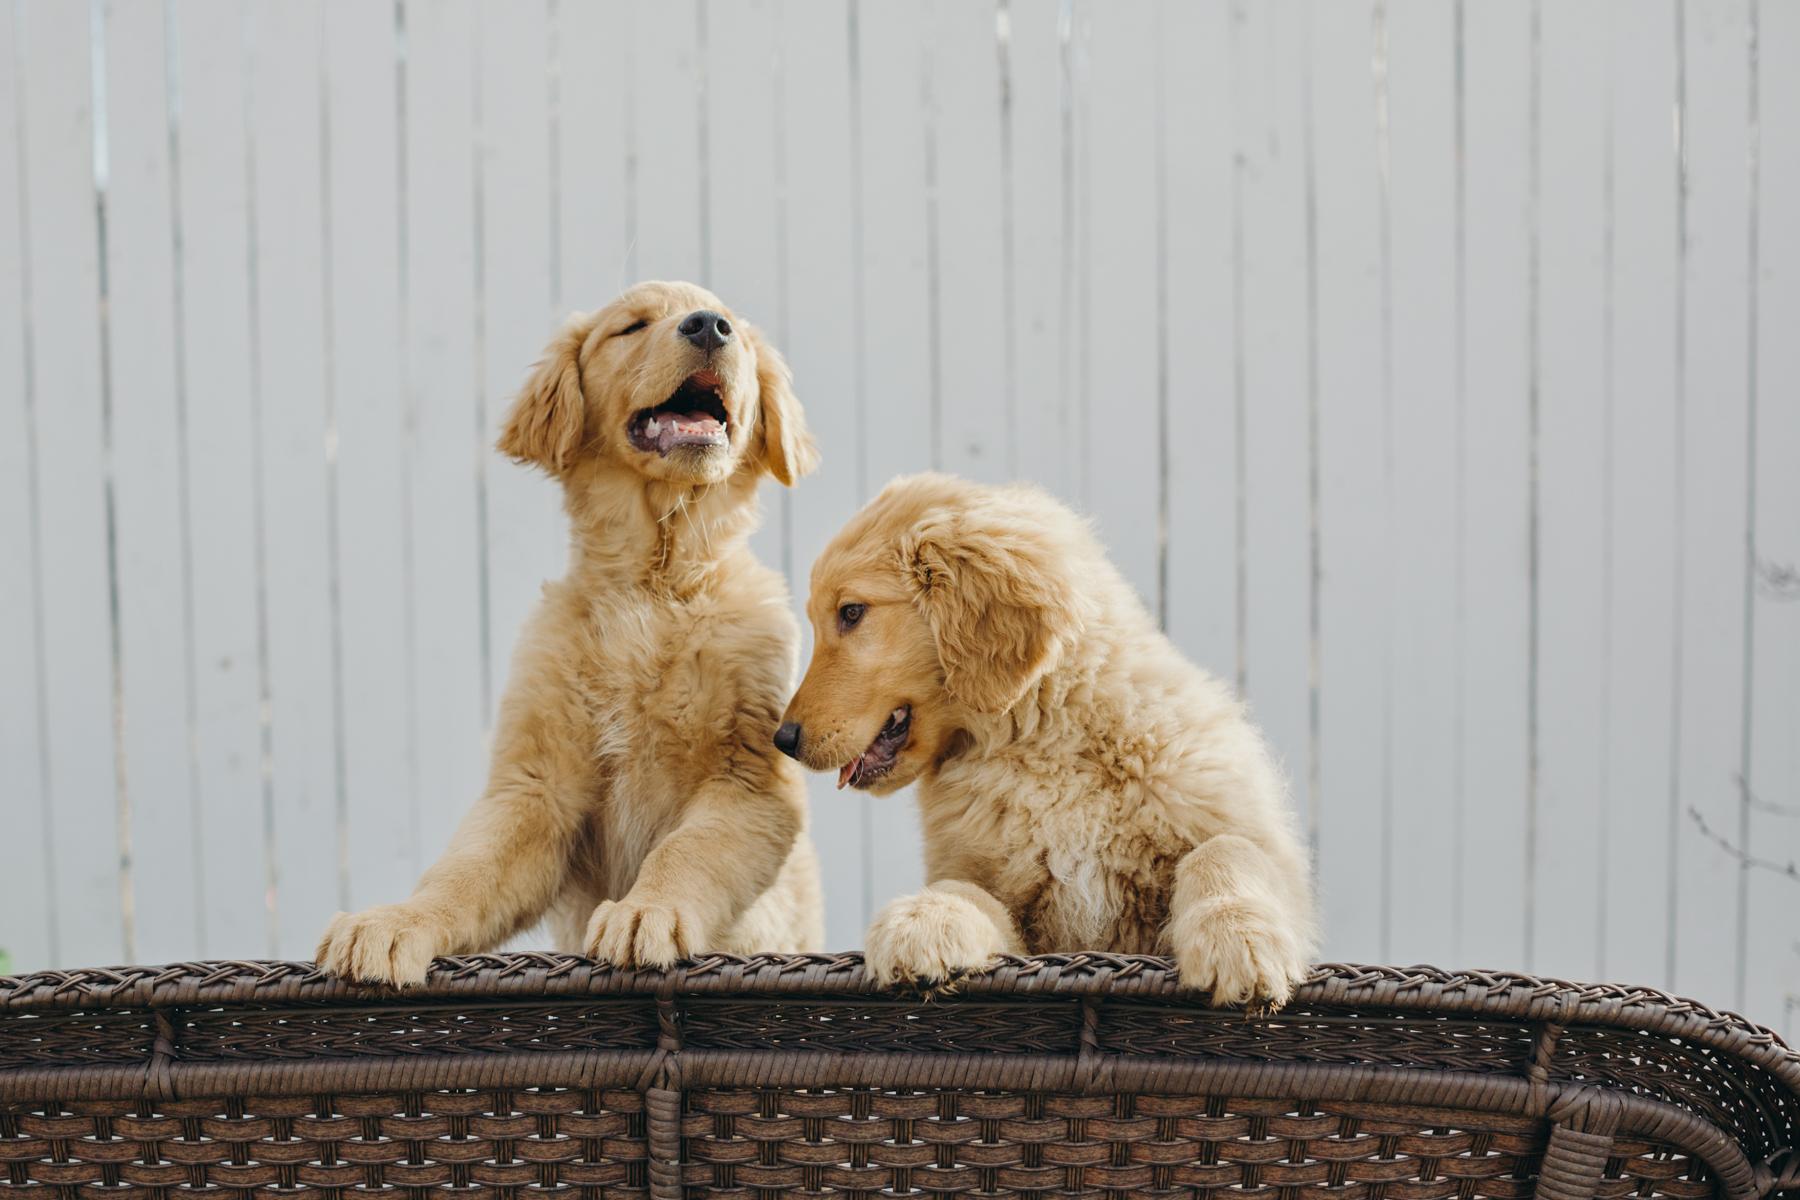 Kim_Golden_Puppies-204.jpg